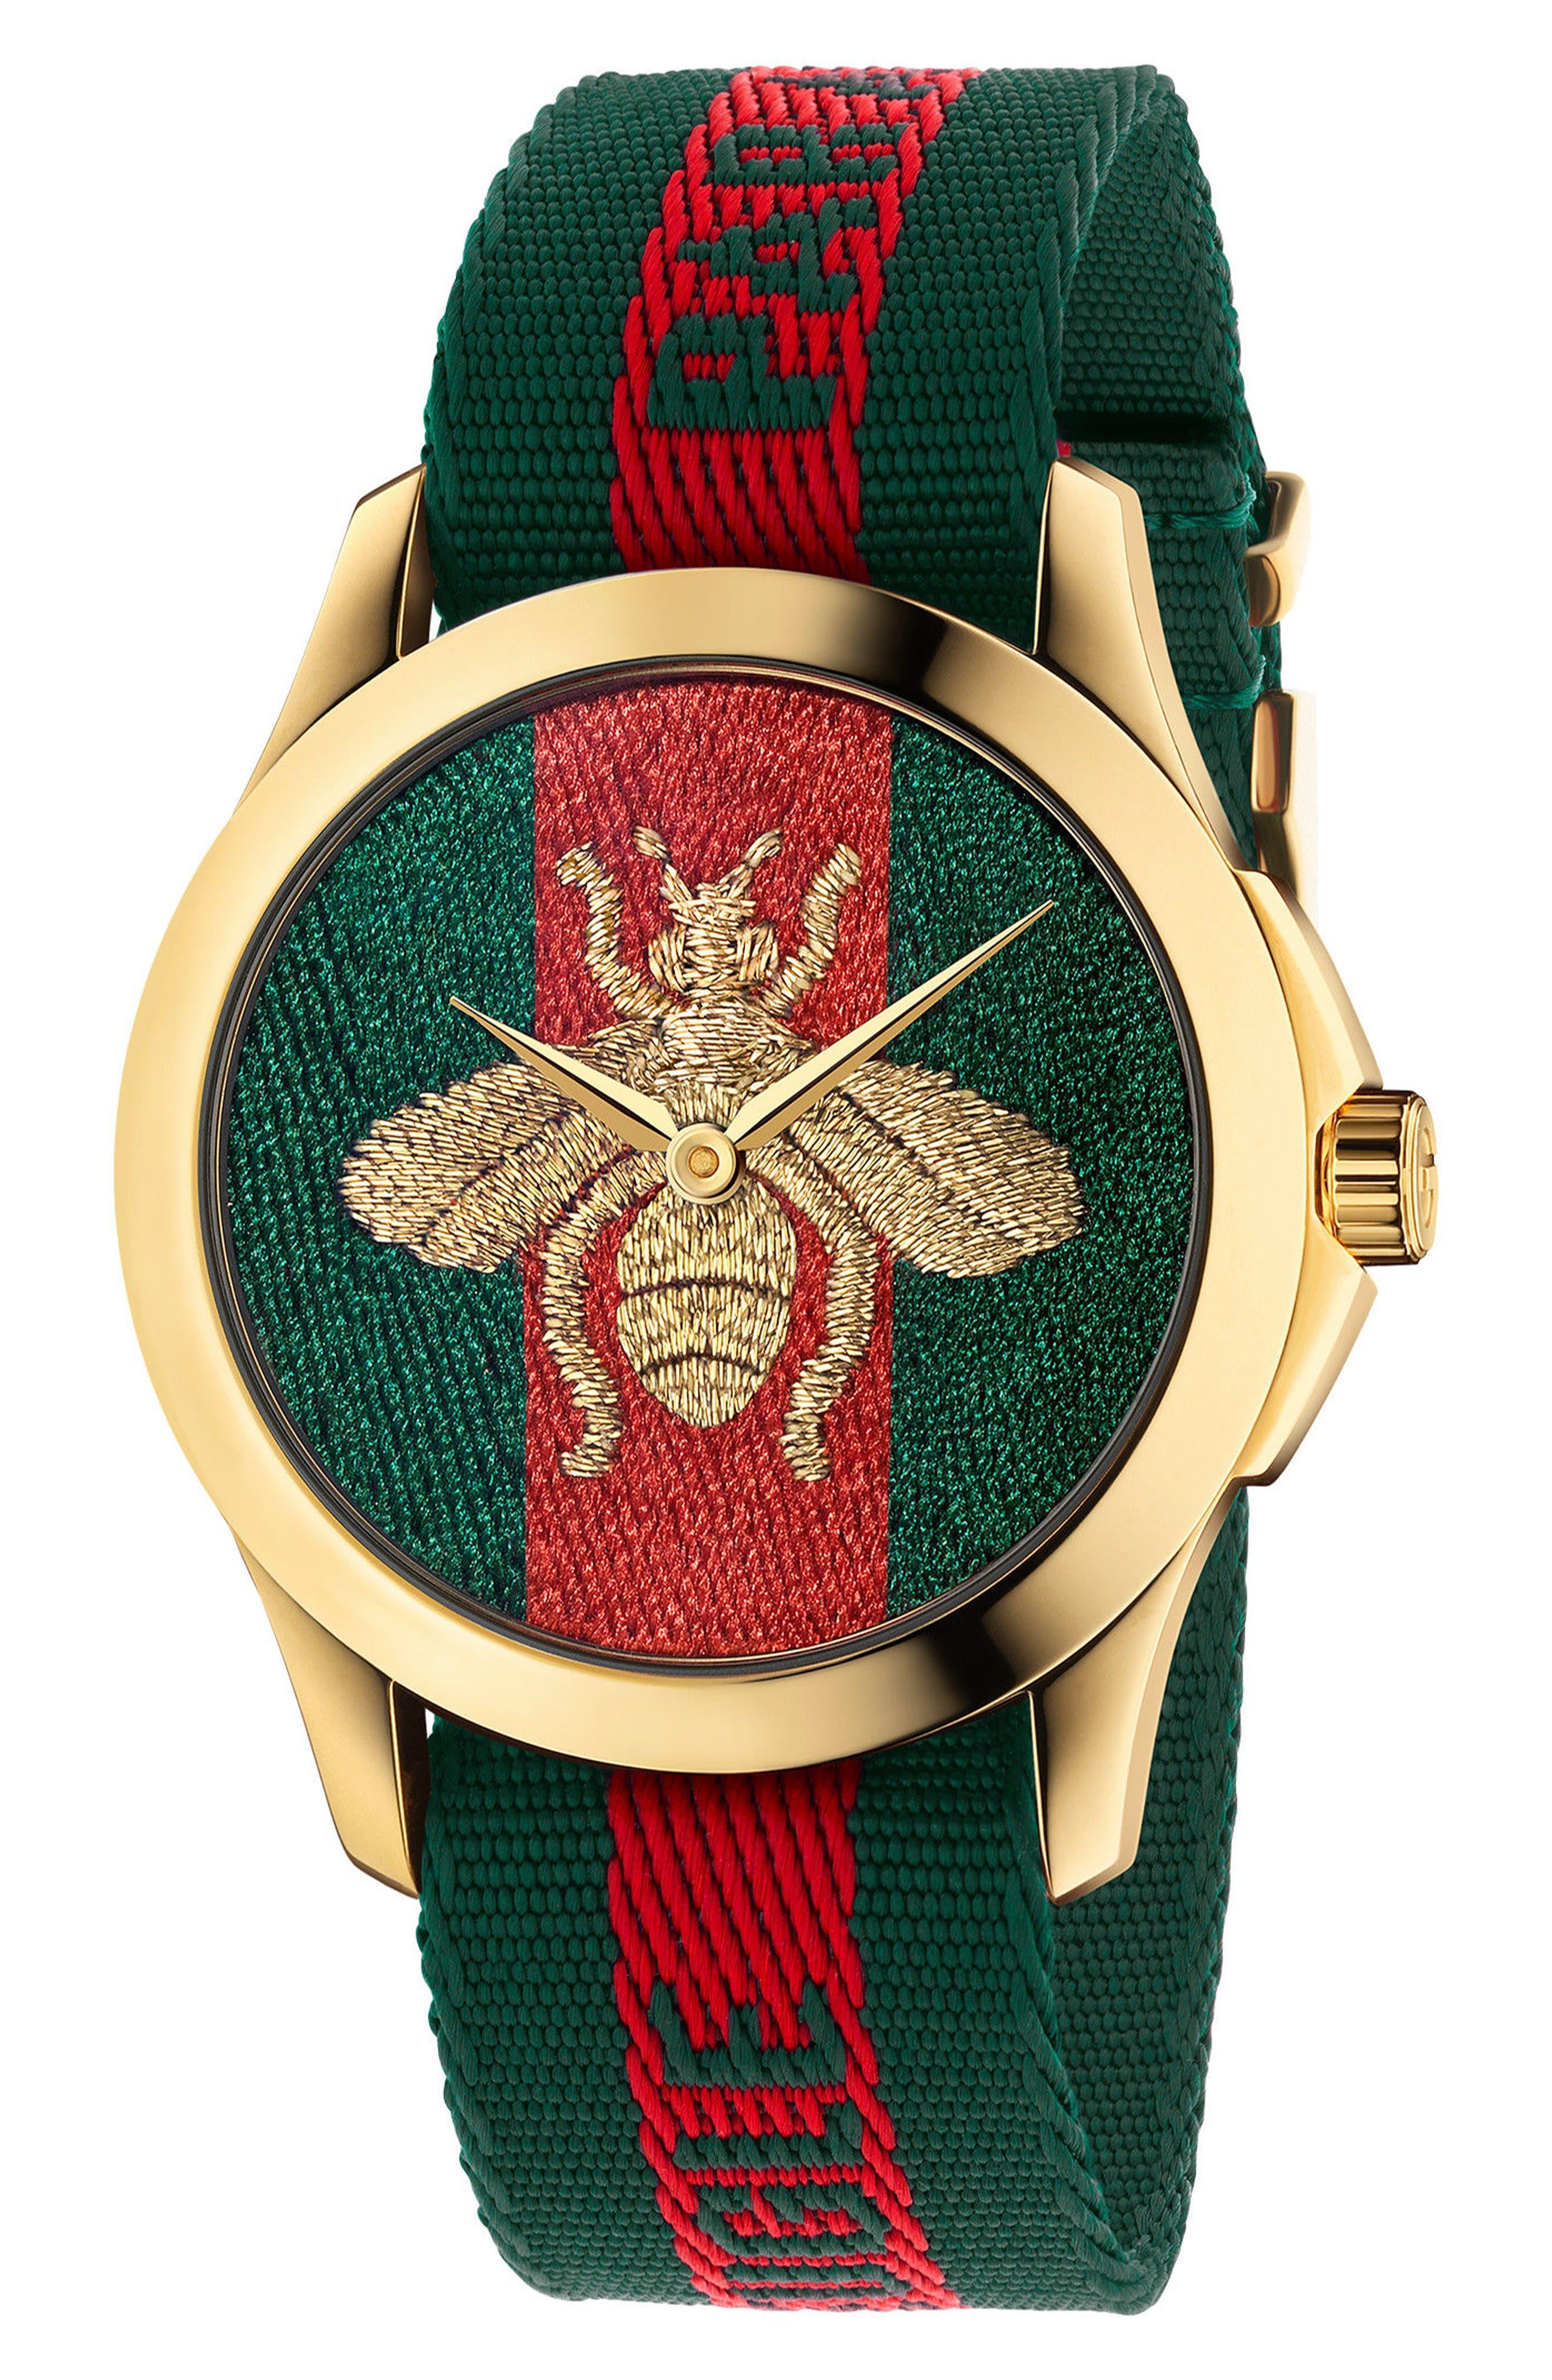 GUCCI, Le Marché Des Merveilles Nylon Strap Watch, 45mm, Main thumbnail 1, color, GREEN/ RED/ GOLD